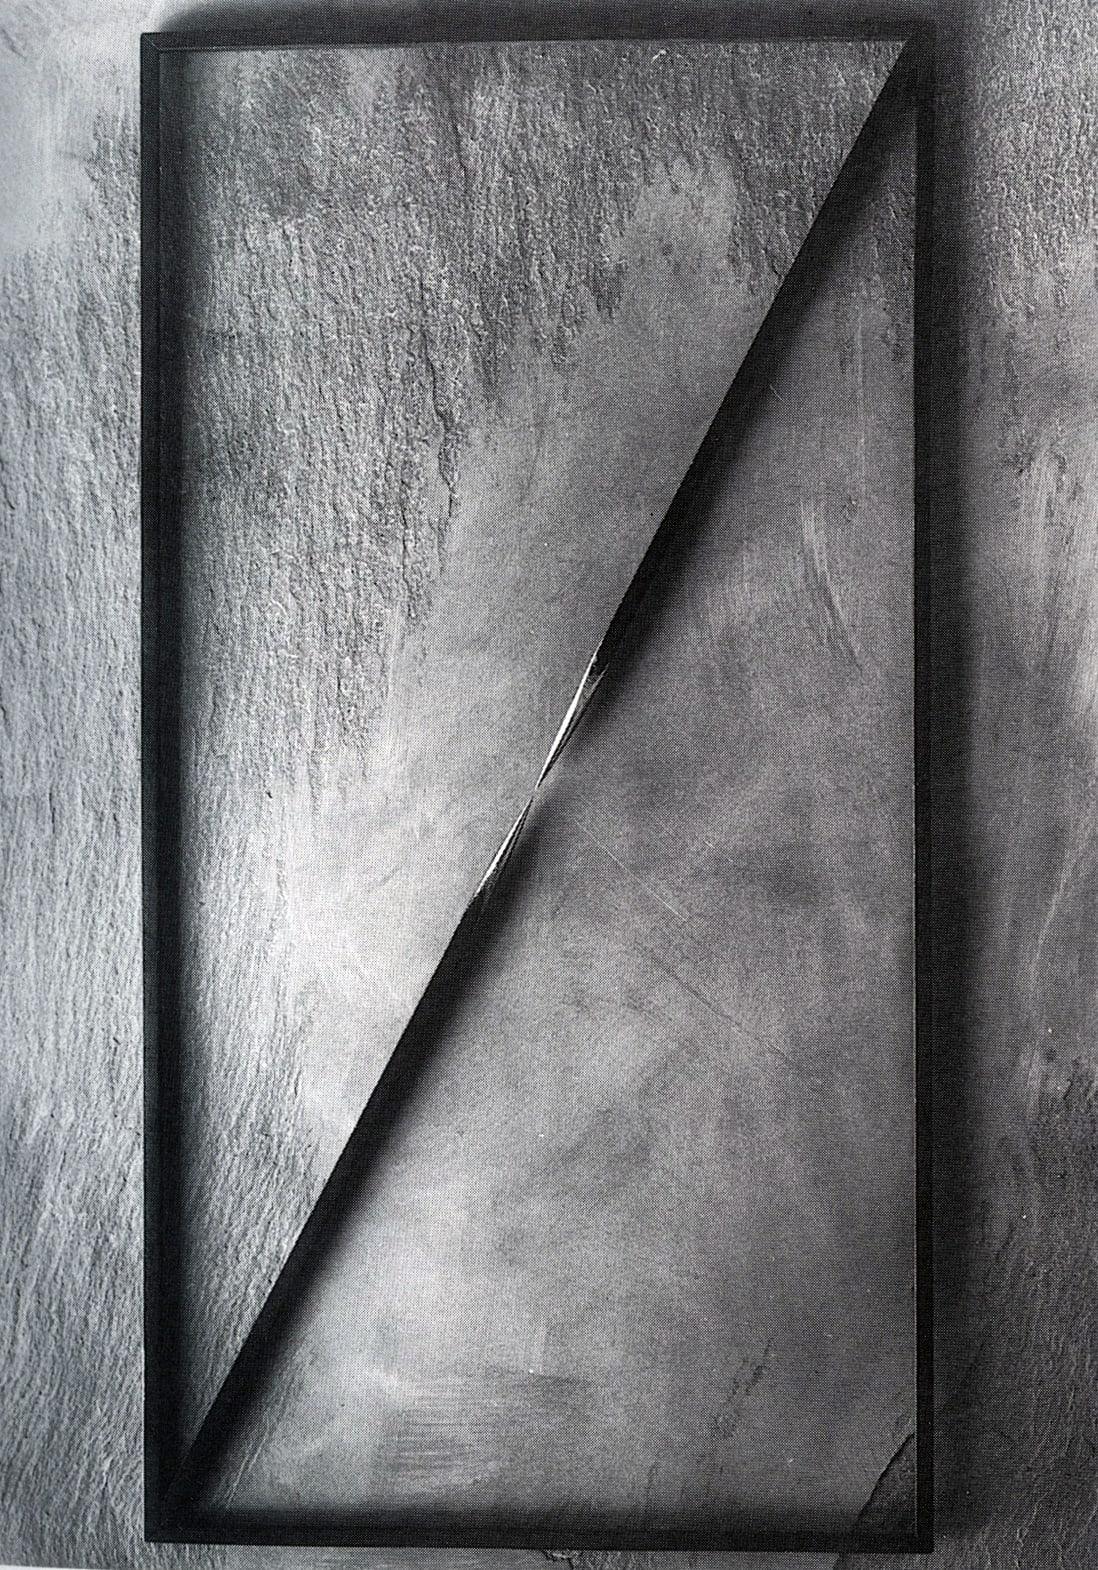 "<span class=""link fancybox-details-link""><a href=""/artists/51-paolo-icaro/works/236-paolo-icaro-luogo-del-punto-diagonale-1973/"">View Detail Page</a></span><div class=""artist""><strong>Paolo Icaro</strong></div> <div class=""title""><em>Luogo del punto diagonale  </em>, 1973</div> <div class=""medium"">acciaio dipinto nero</div> <div class=""dimensions"">cm 80 x 42</div><div class=""copyright_line"">Copyright Lorenzelli Arte</div>"